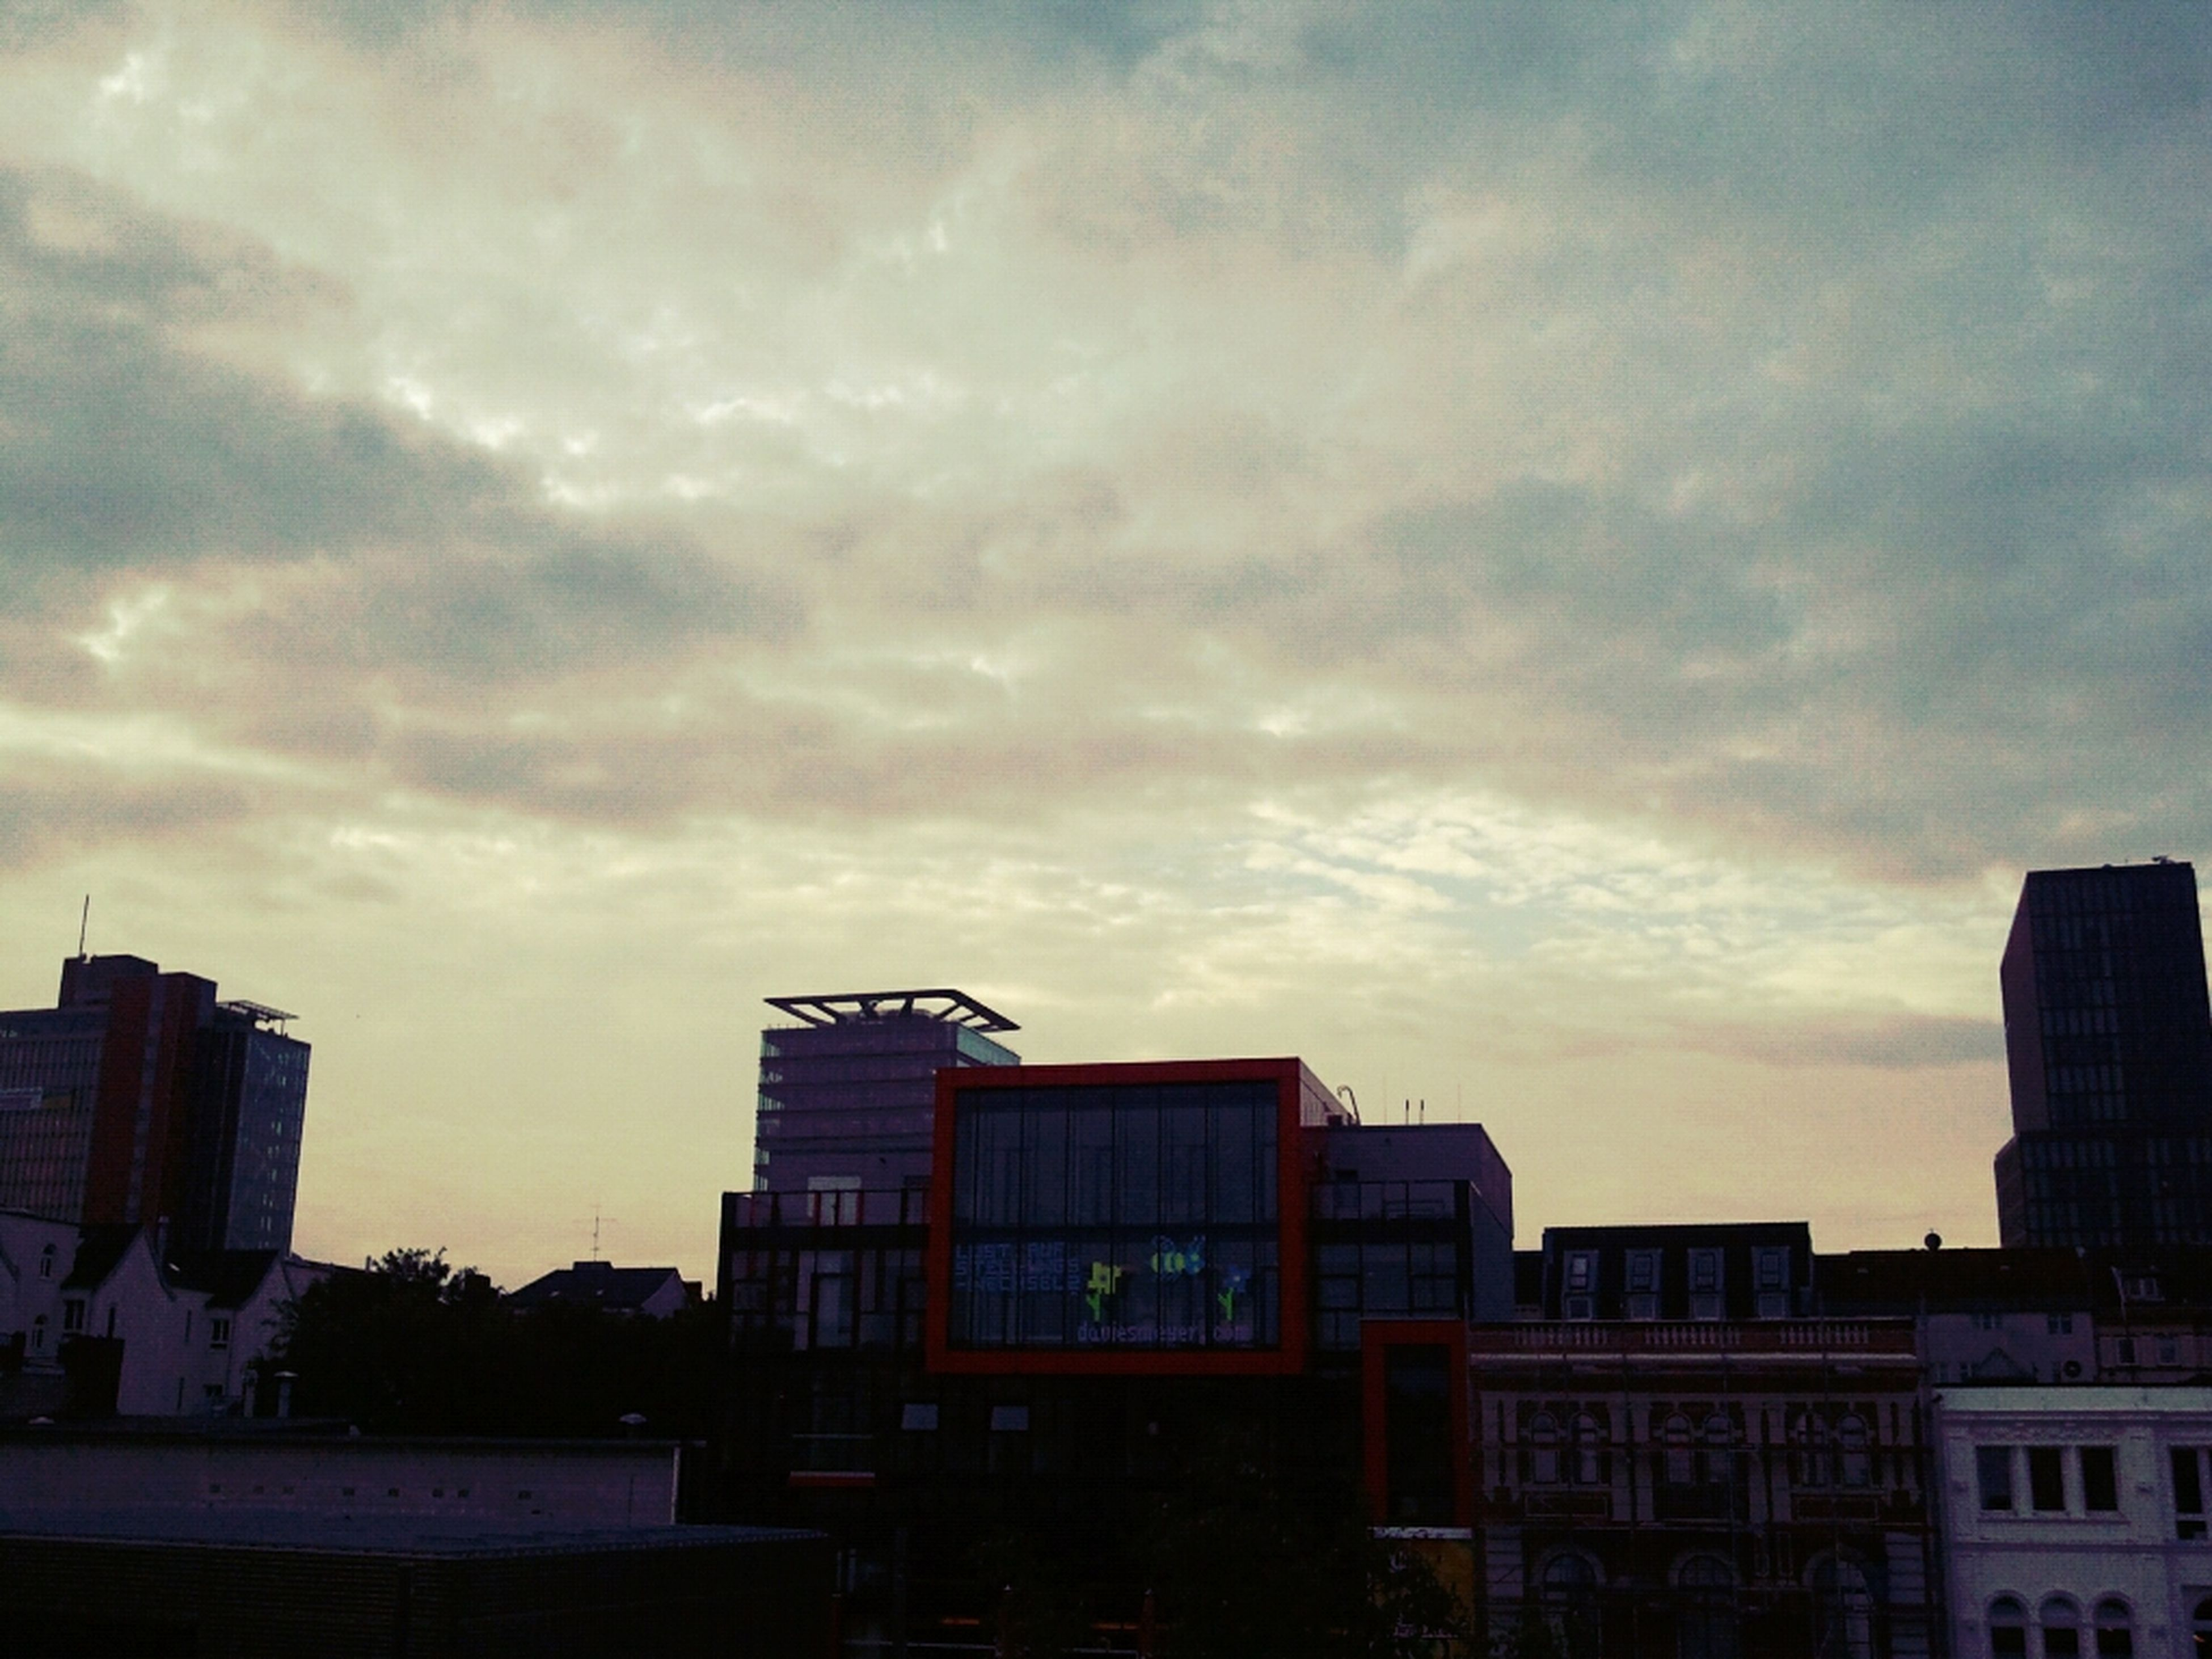 building exterior, architecture, built structure, sky, city, cloud - sky, sunset, cloudy, building, residential building, low angle view, cloud, residential structure, cityscape, skyscraper, city life, weather, modern, dusk, overcast